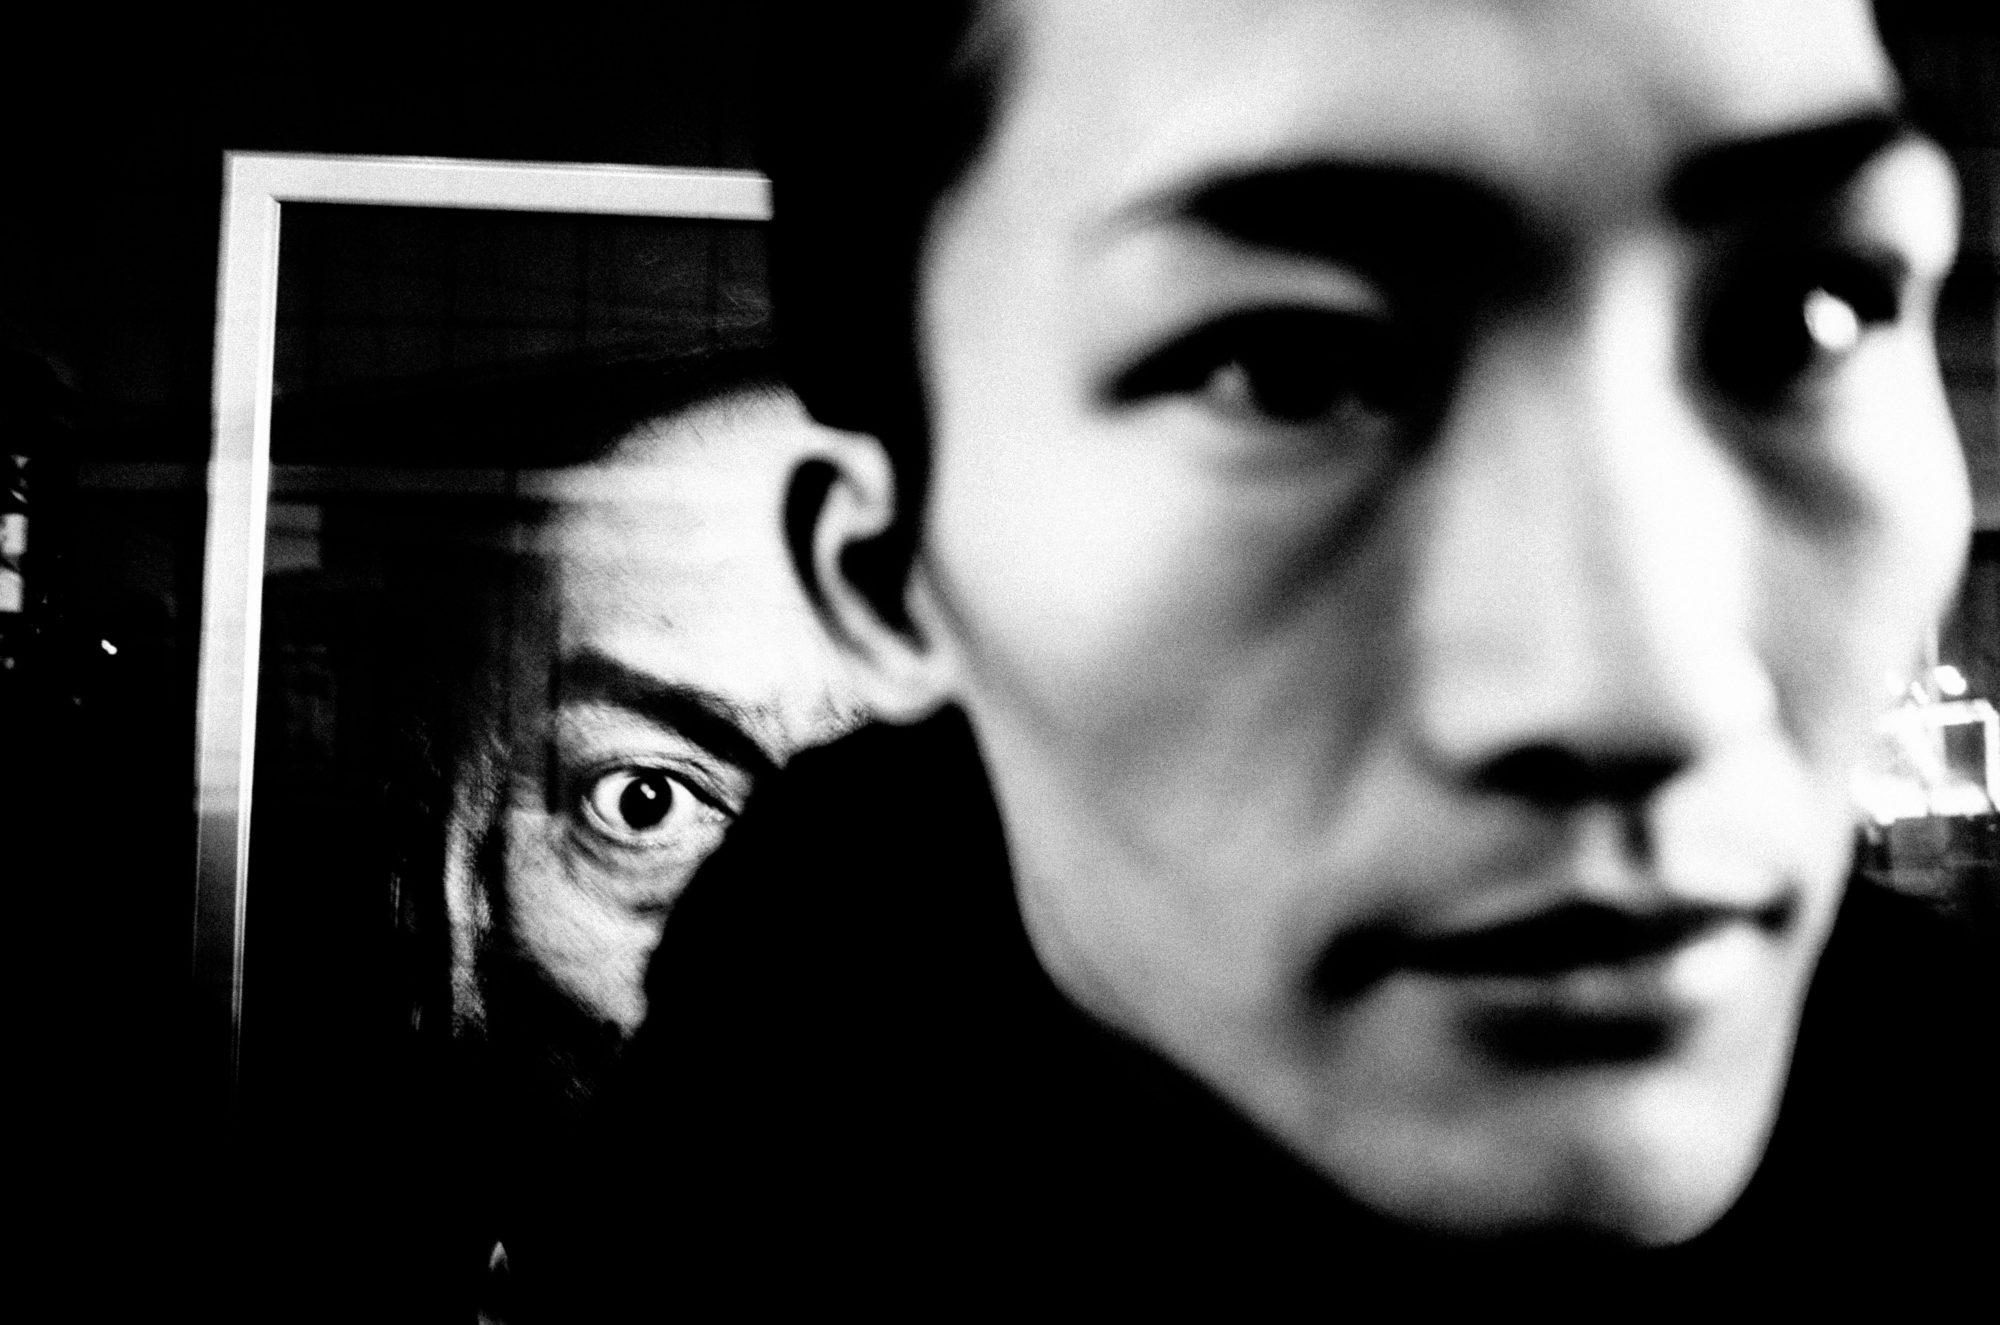 tokyo-eye-eric-kim-street-photography-contact-sheet-0000543